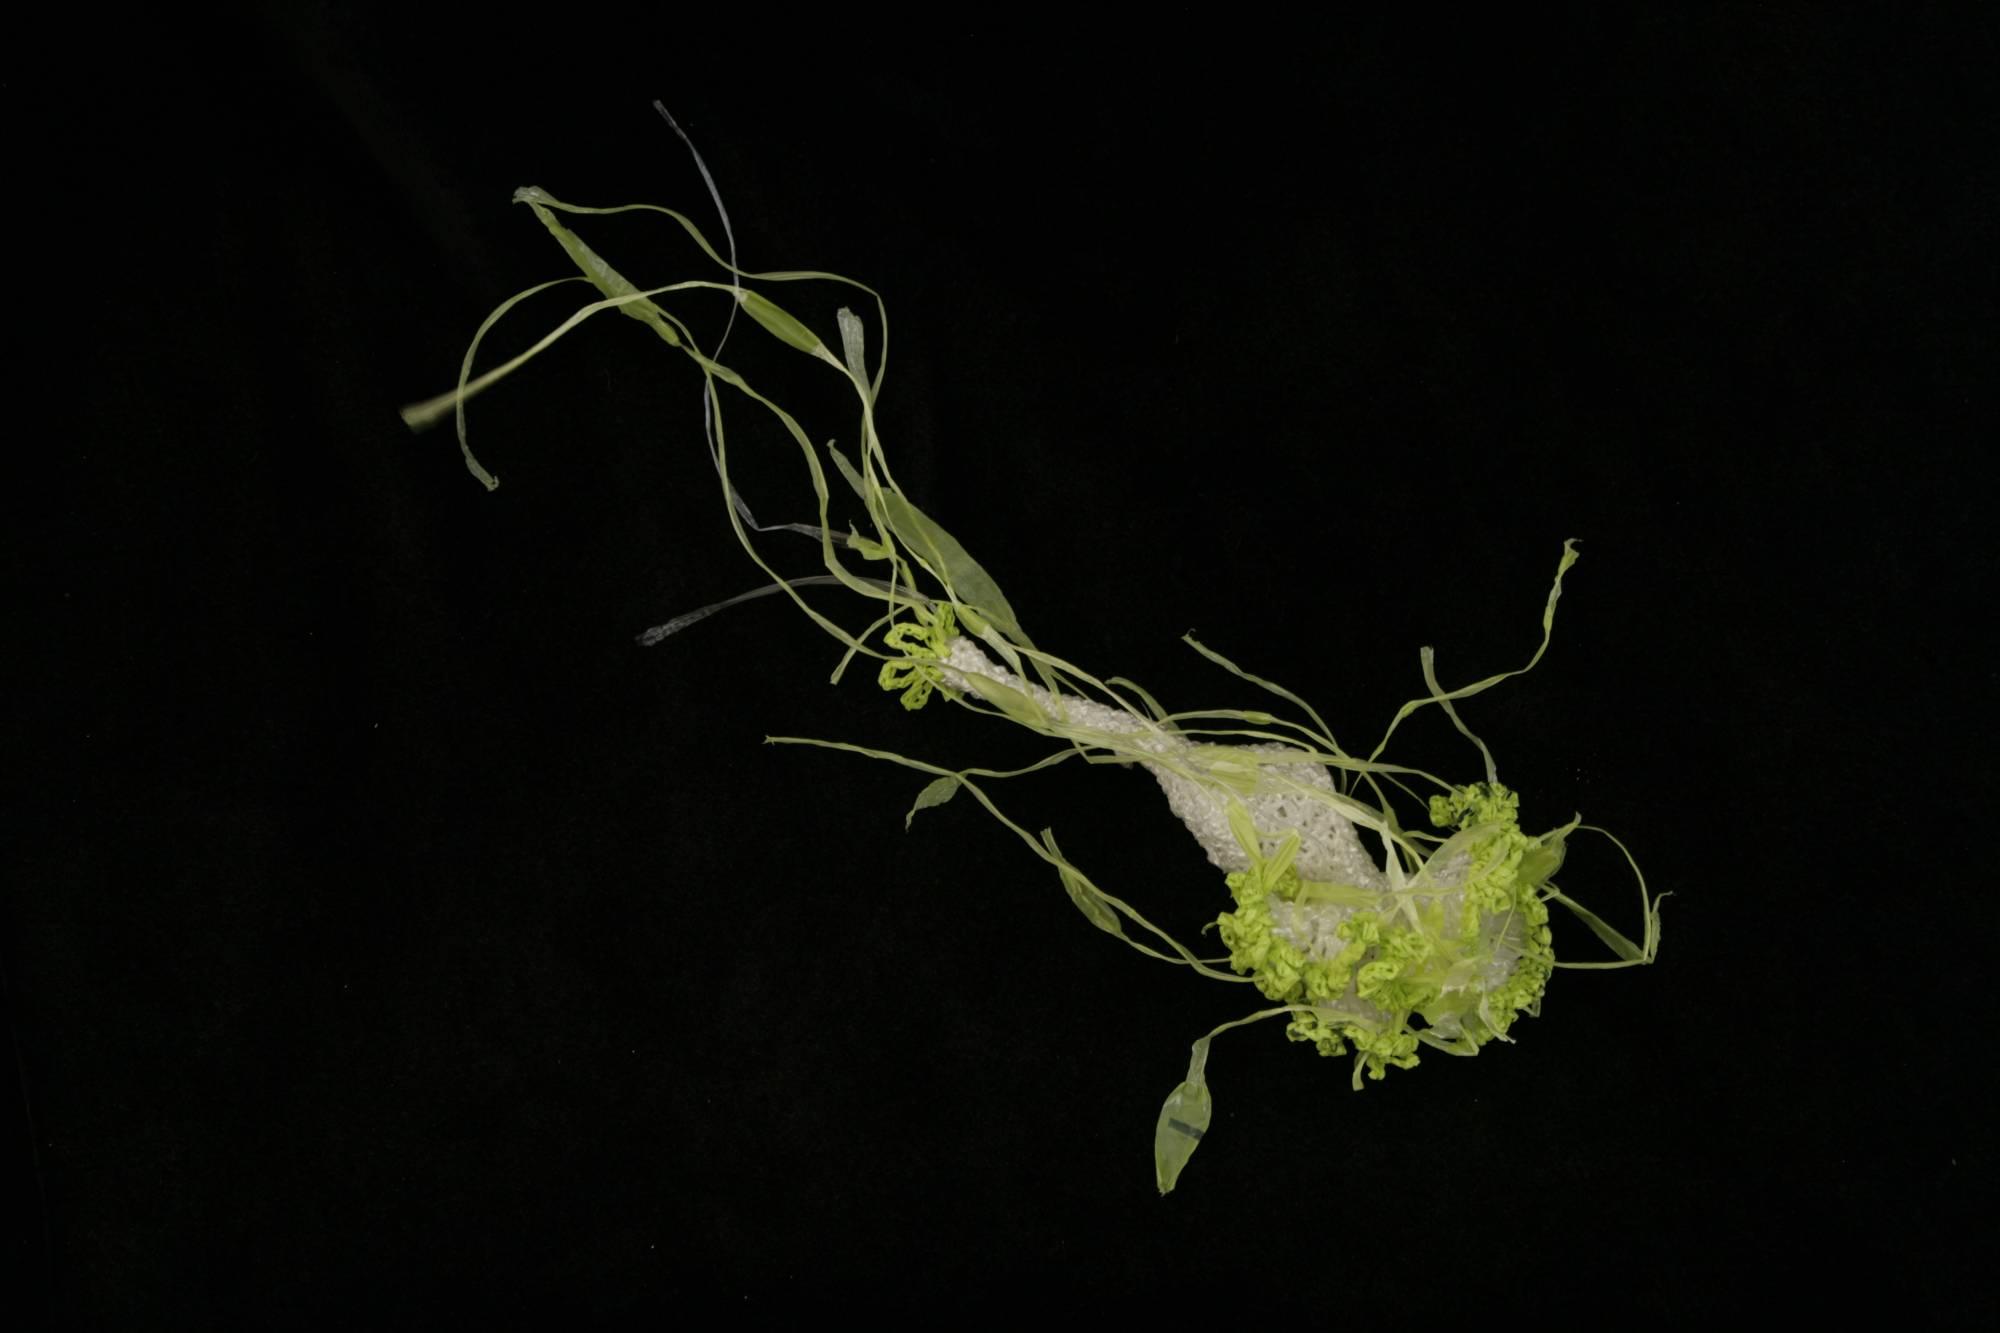 Green jellyfish sculpture on black background